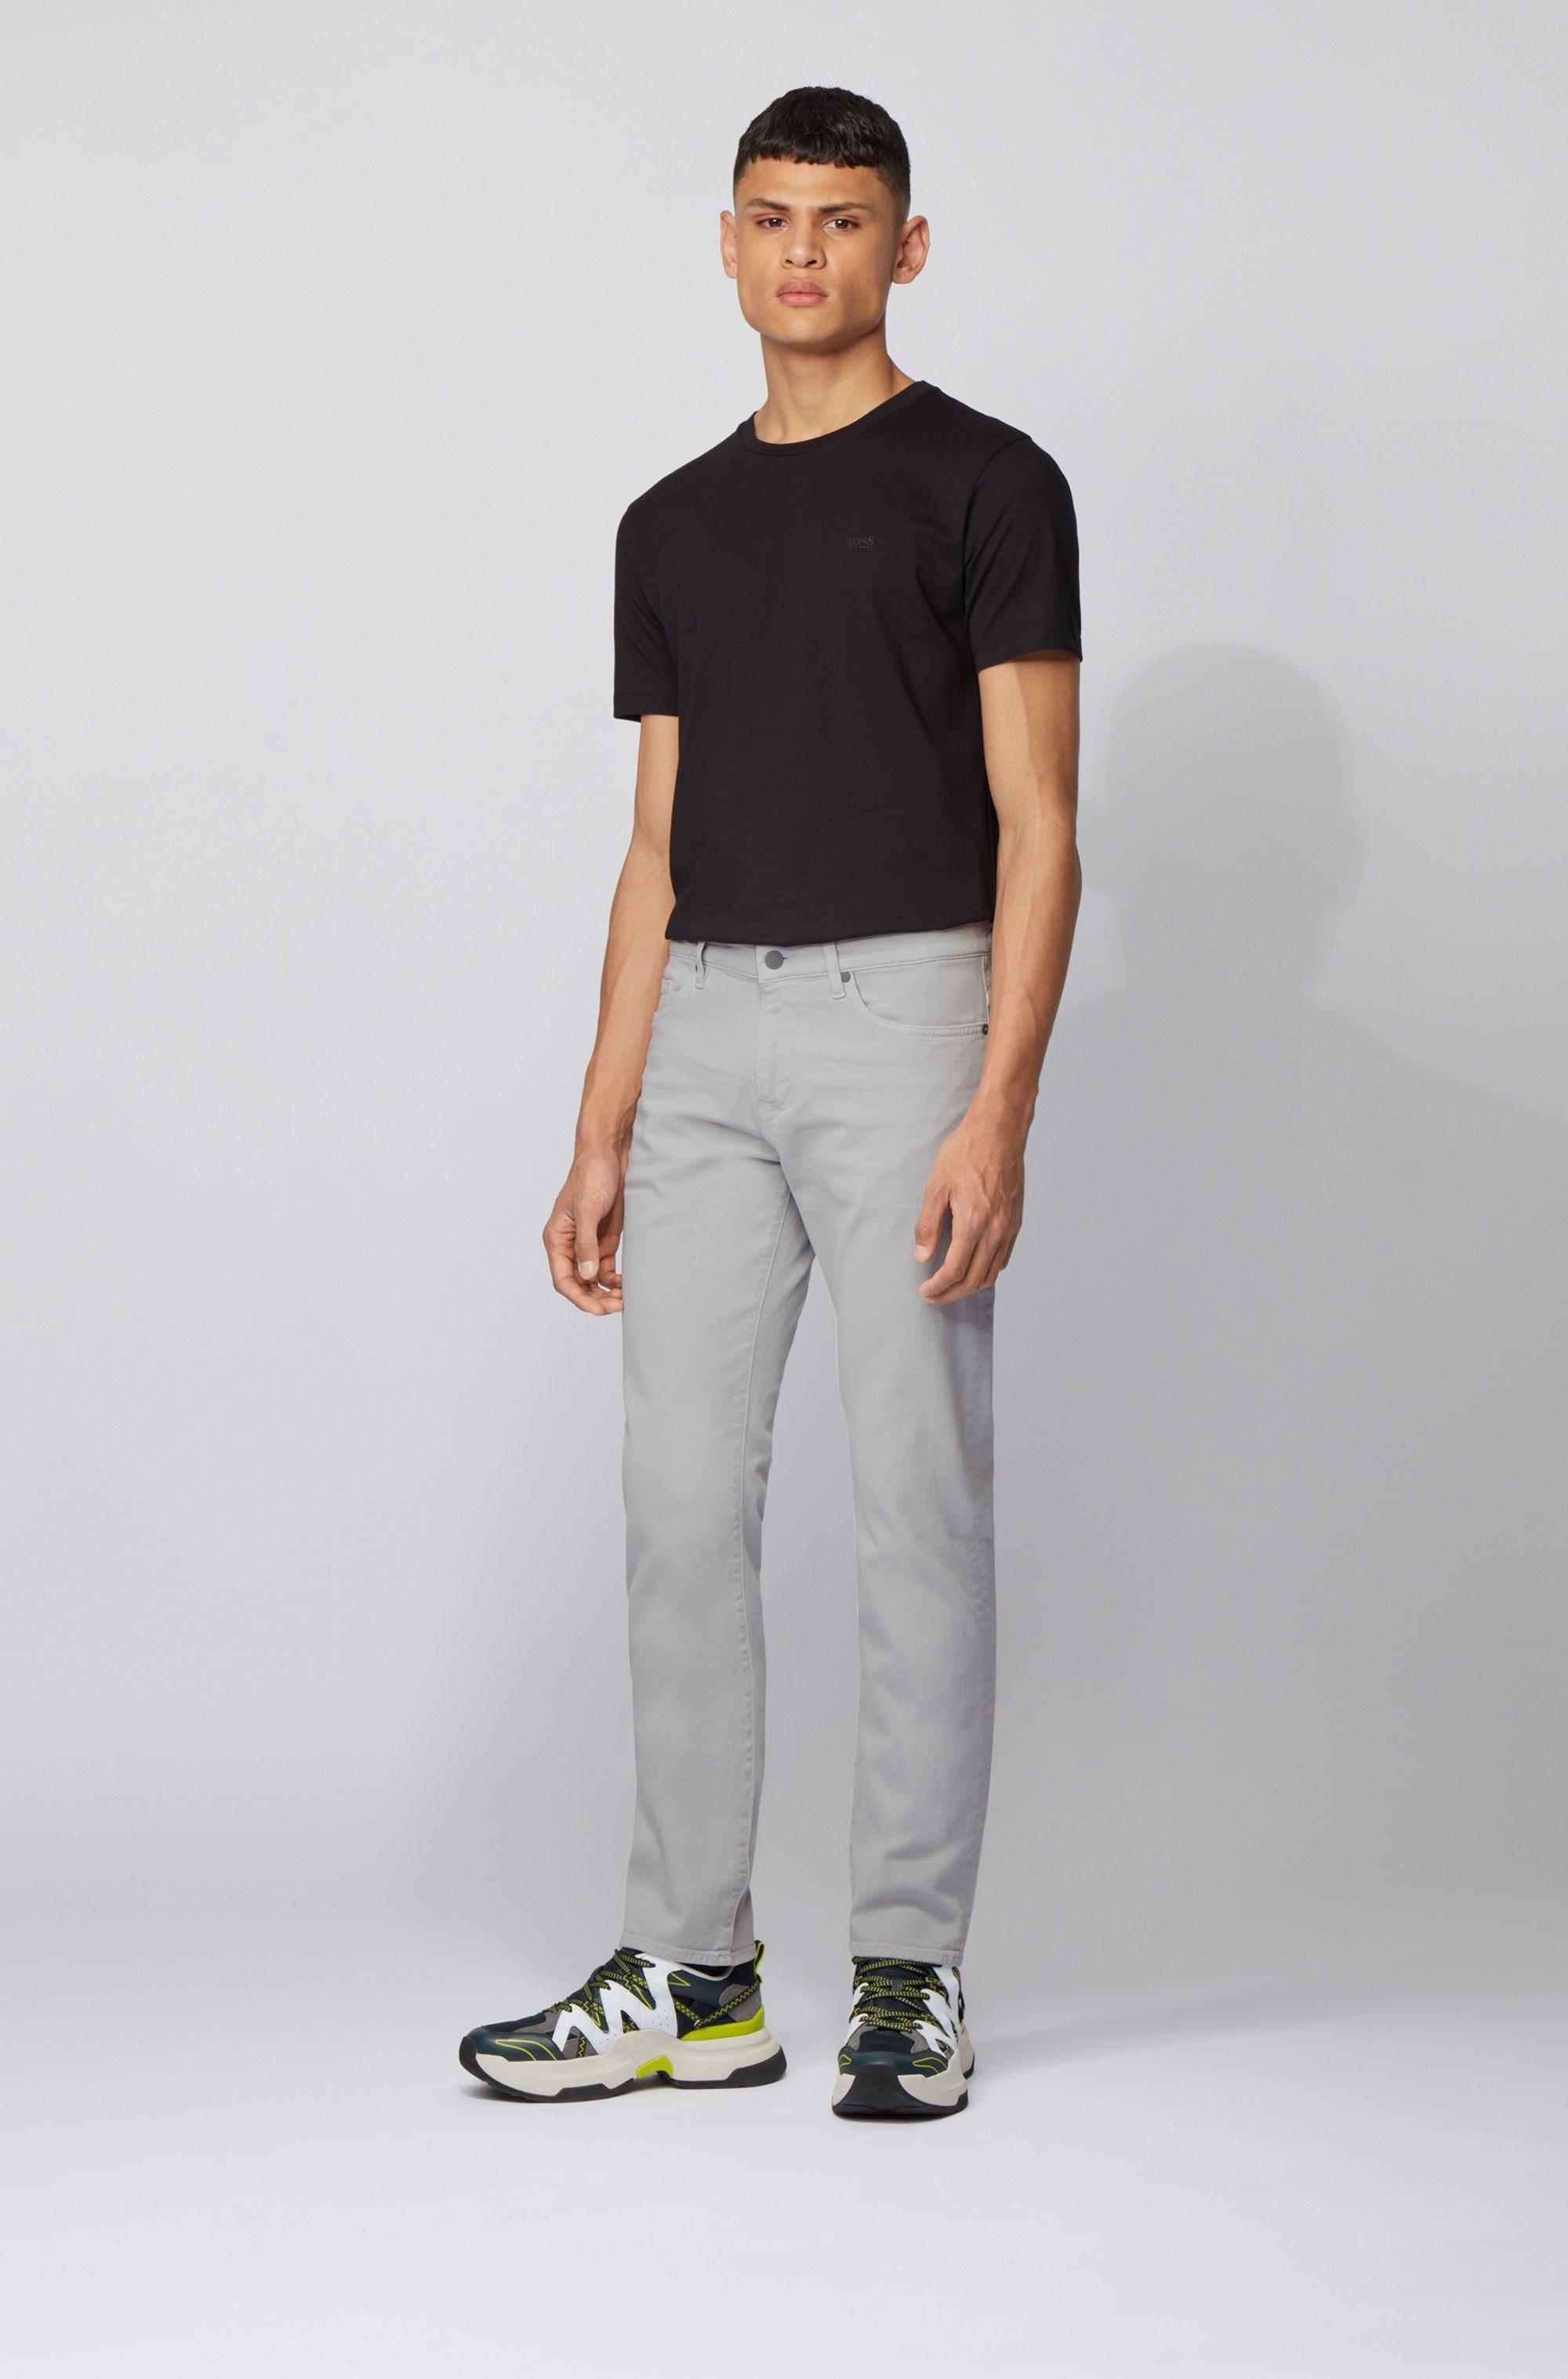 Slim-Fit Jeans aus besonders softem italienischem Stretch-Denim